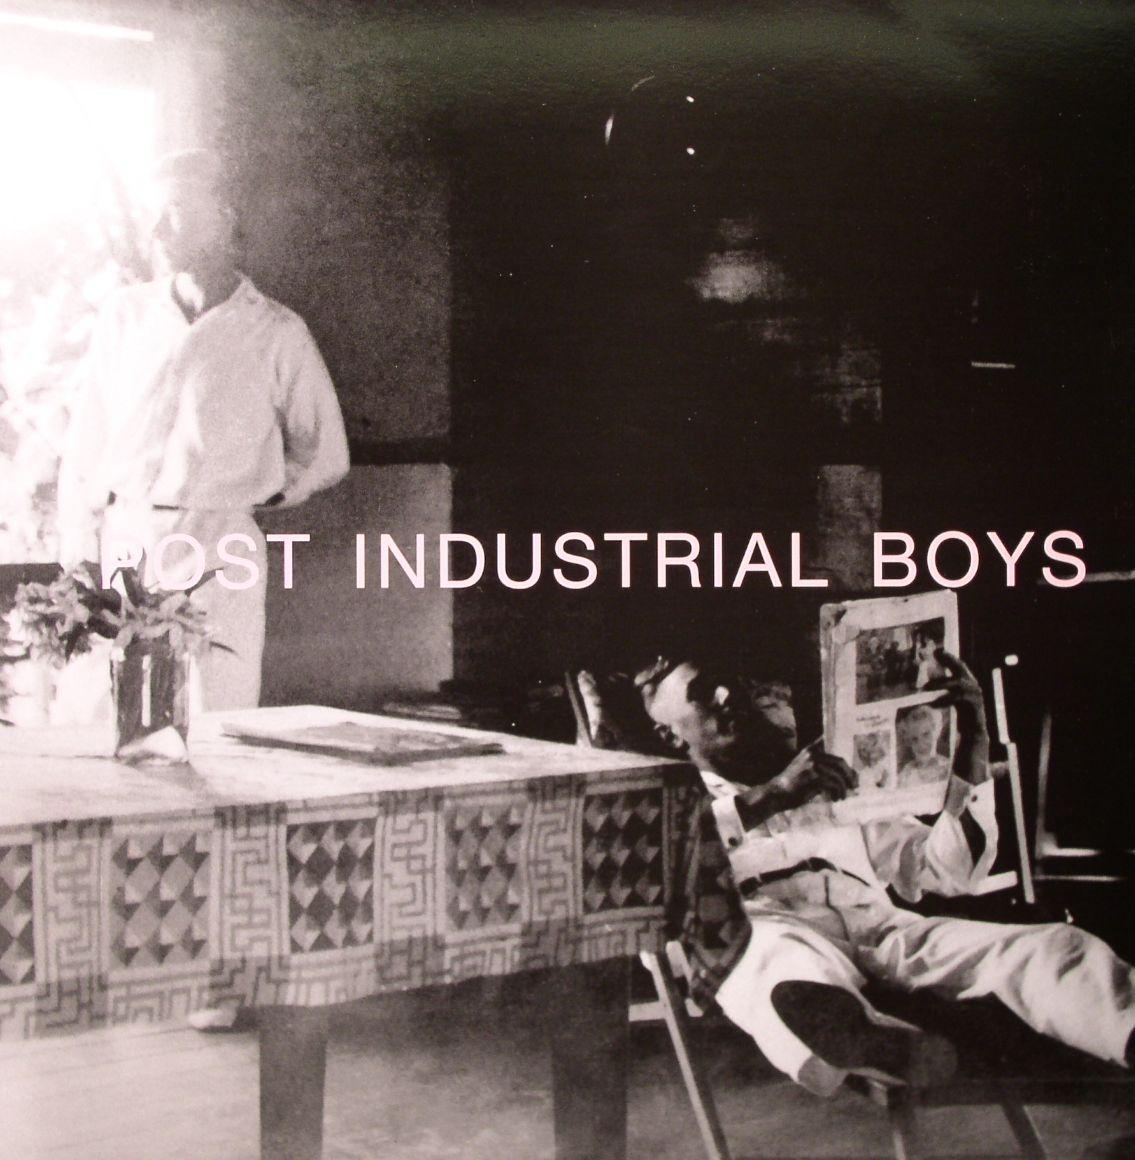 GOGI GE ORG - Post Industrial Boys